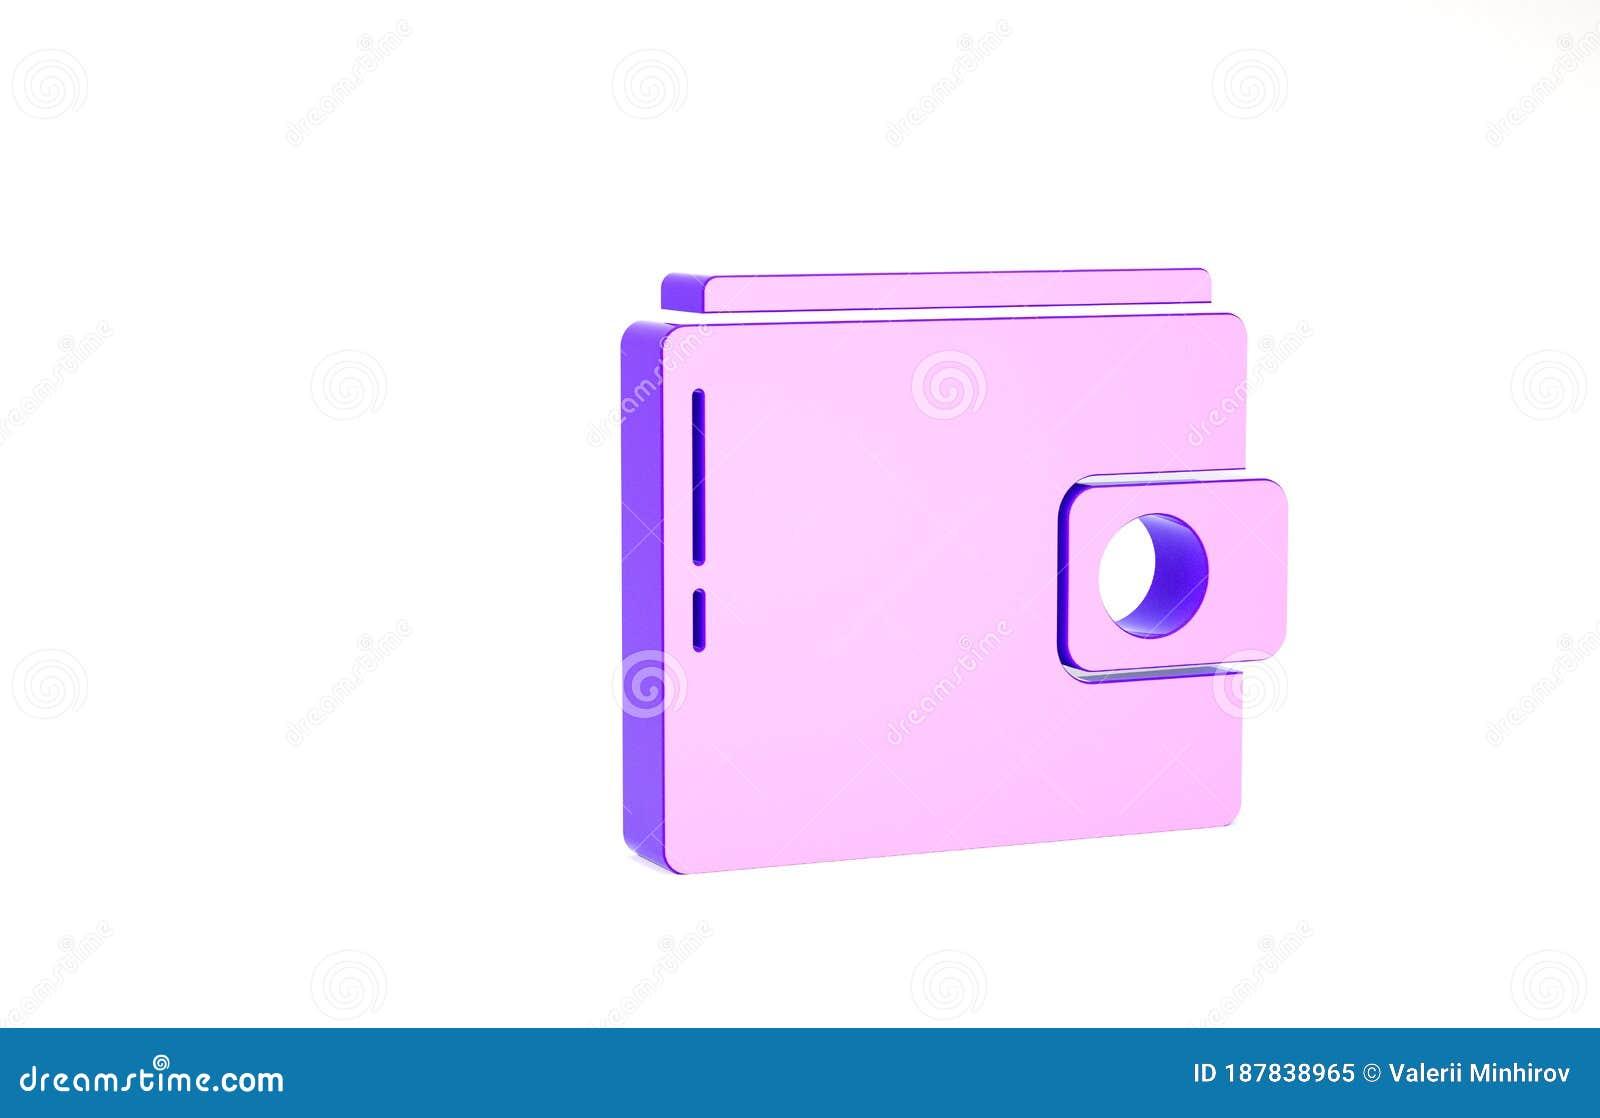 purple wallet icon isolated on white background purse icon cash savings symbol minimalism concept 3d illustration 3d stock illustration illustration of object economy 187838965 dreamstime com